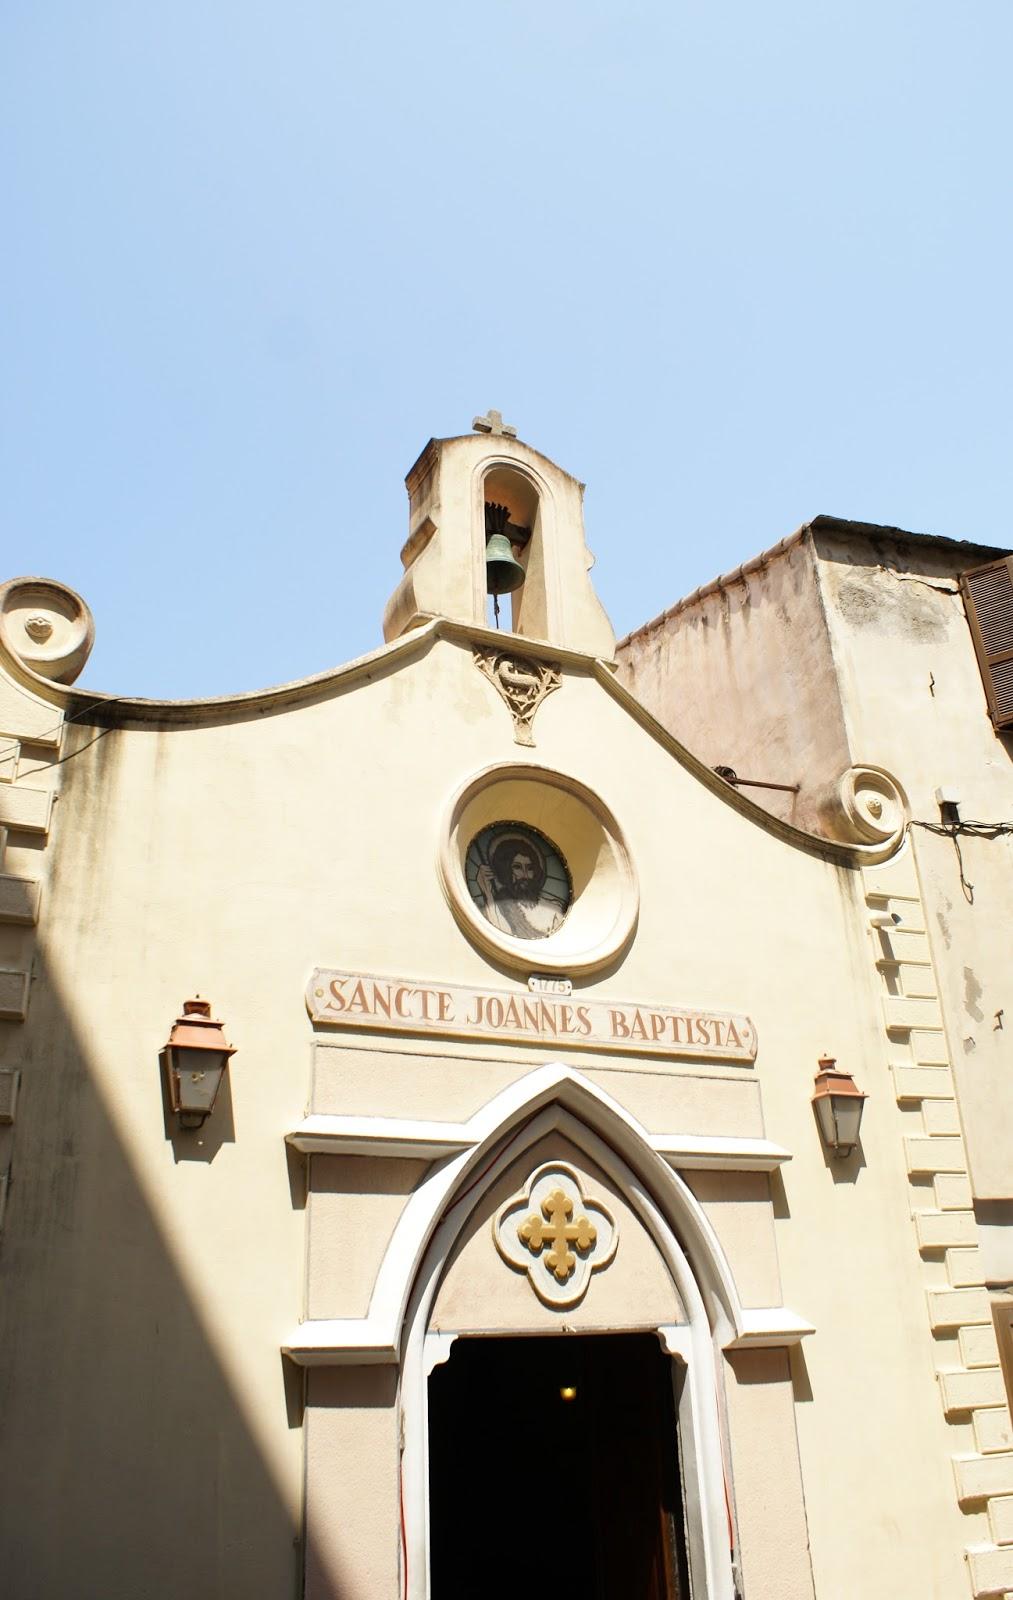 bonifacio corse corsica sancte johannes batista saint jean baptiste